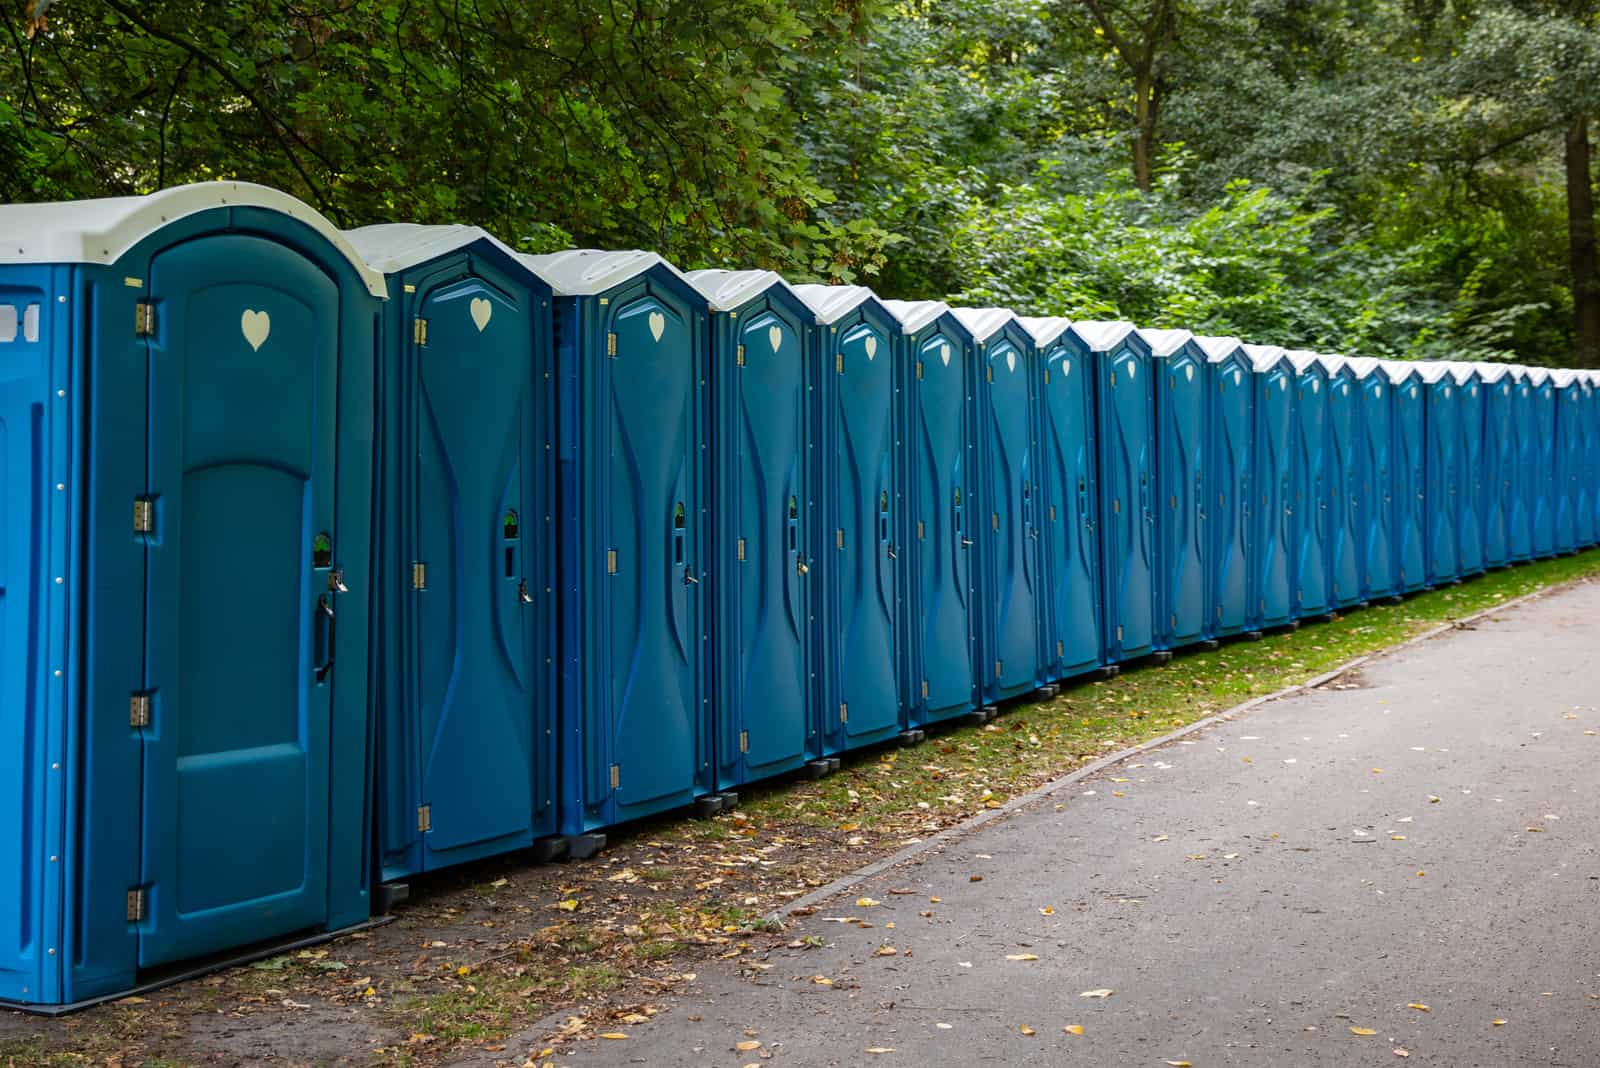 mobile Toiletten im Wald